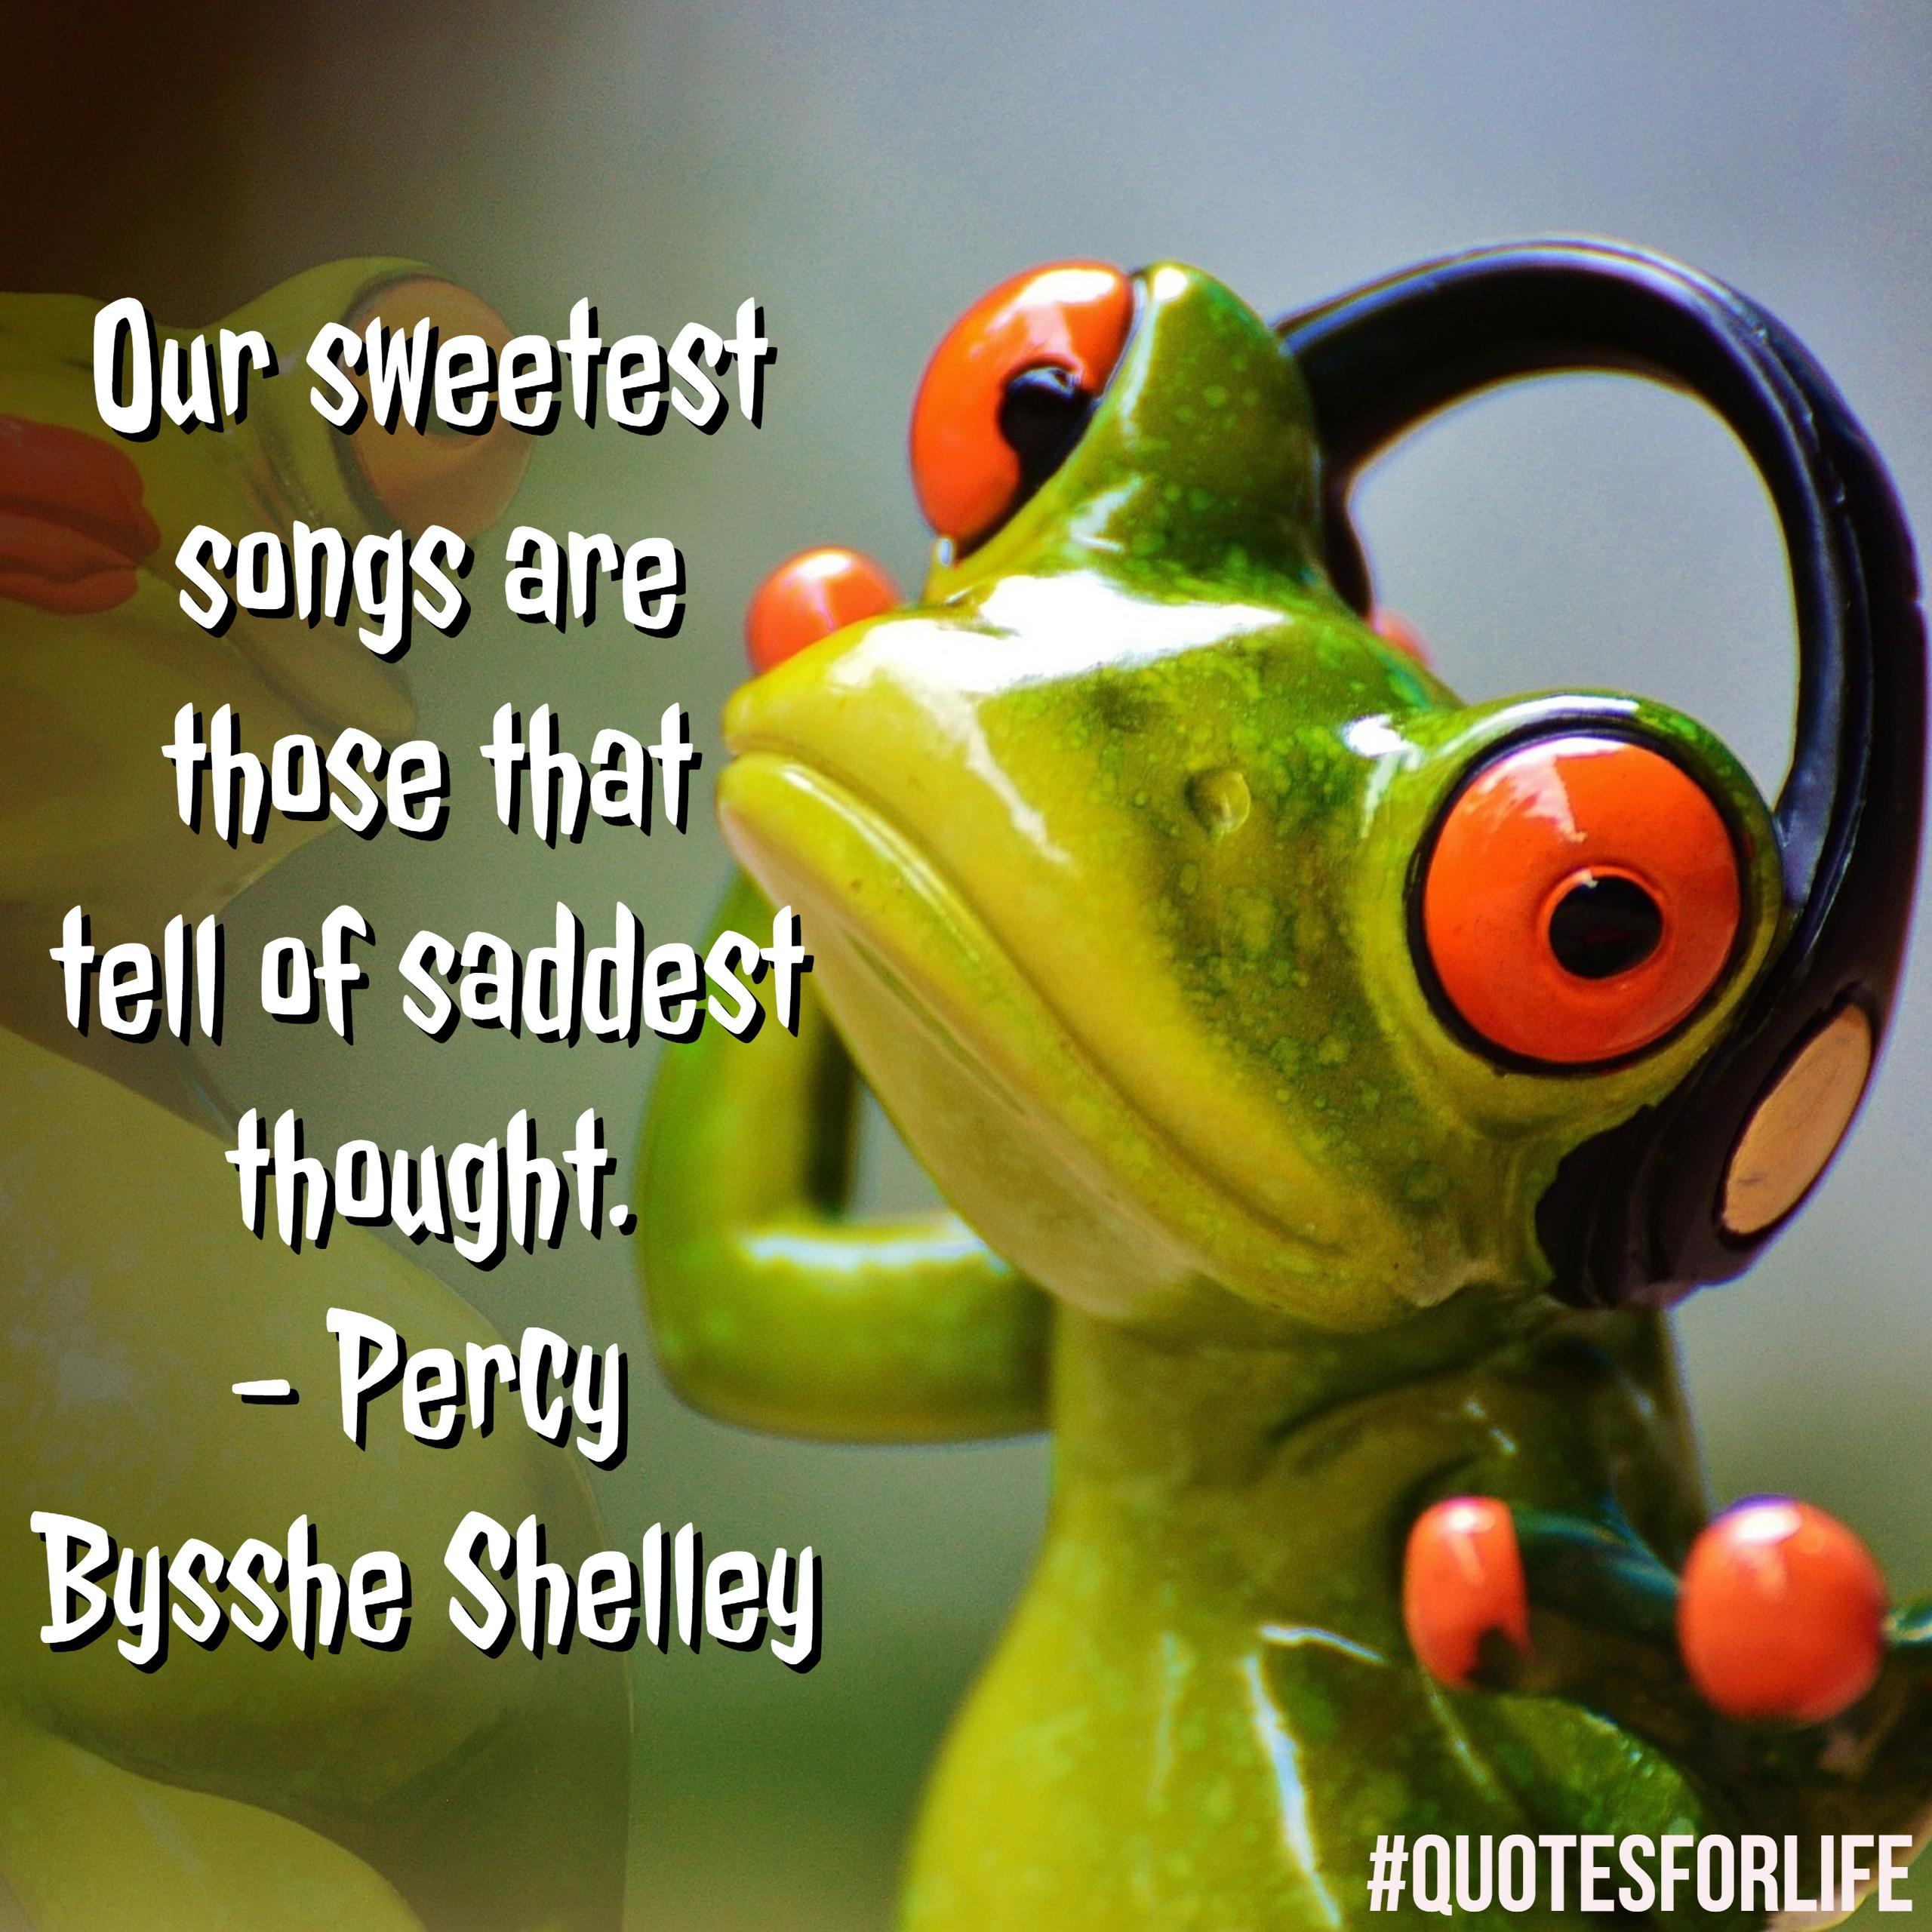 Percy Bysshe Shelley